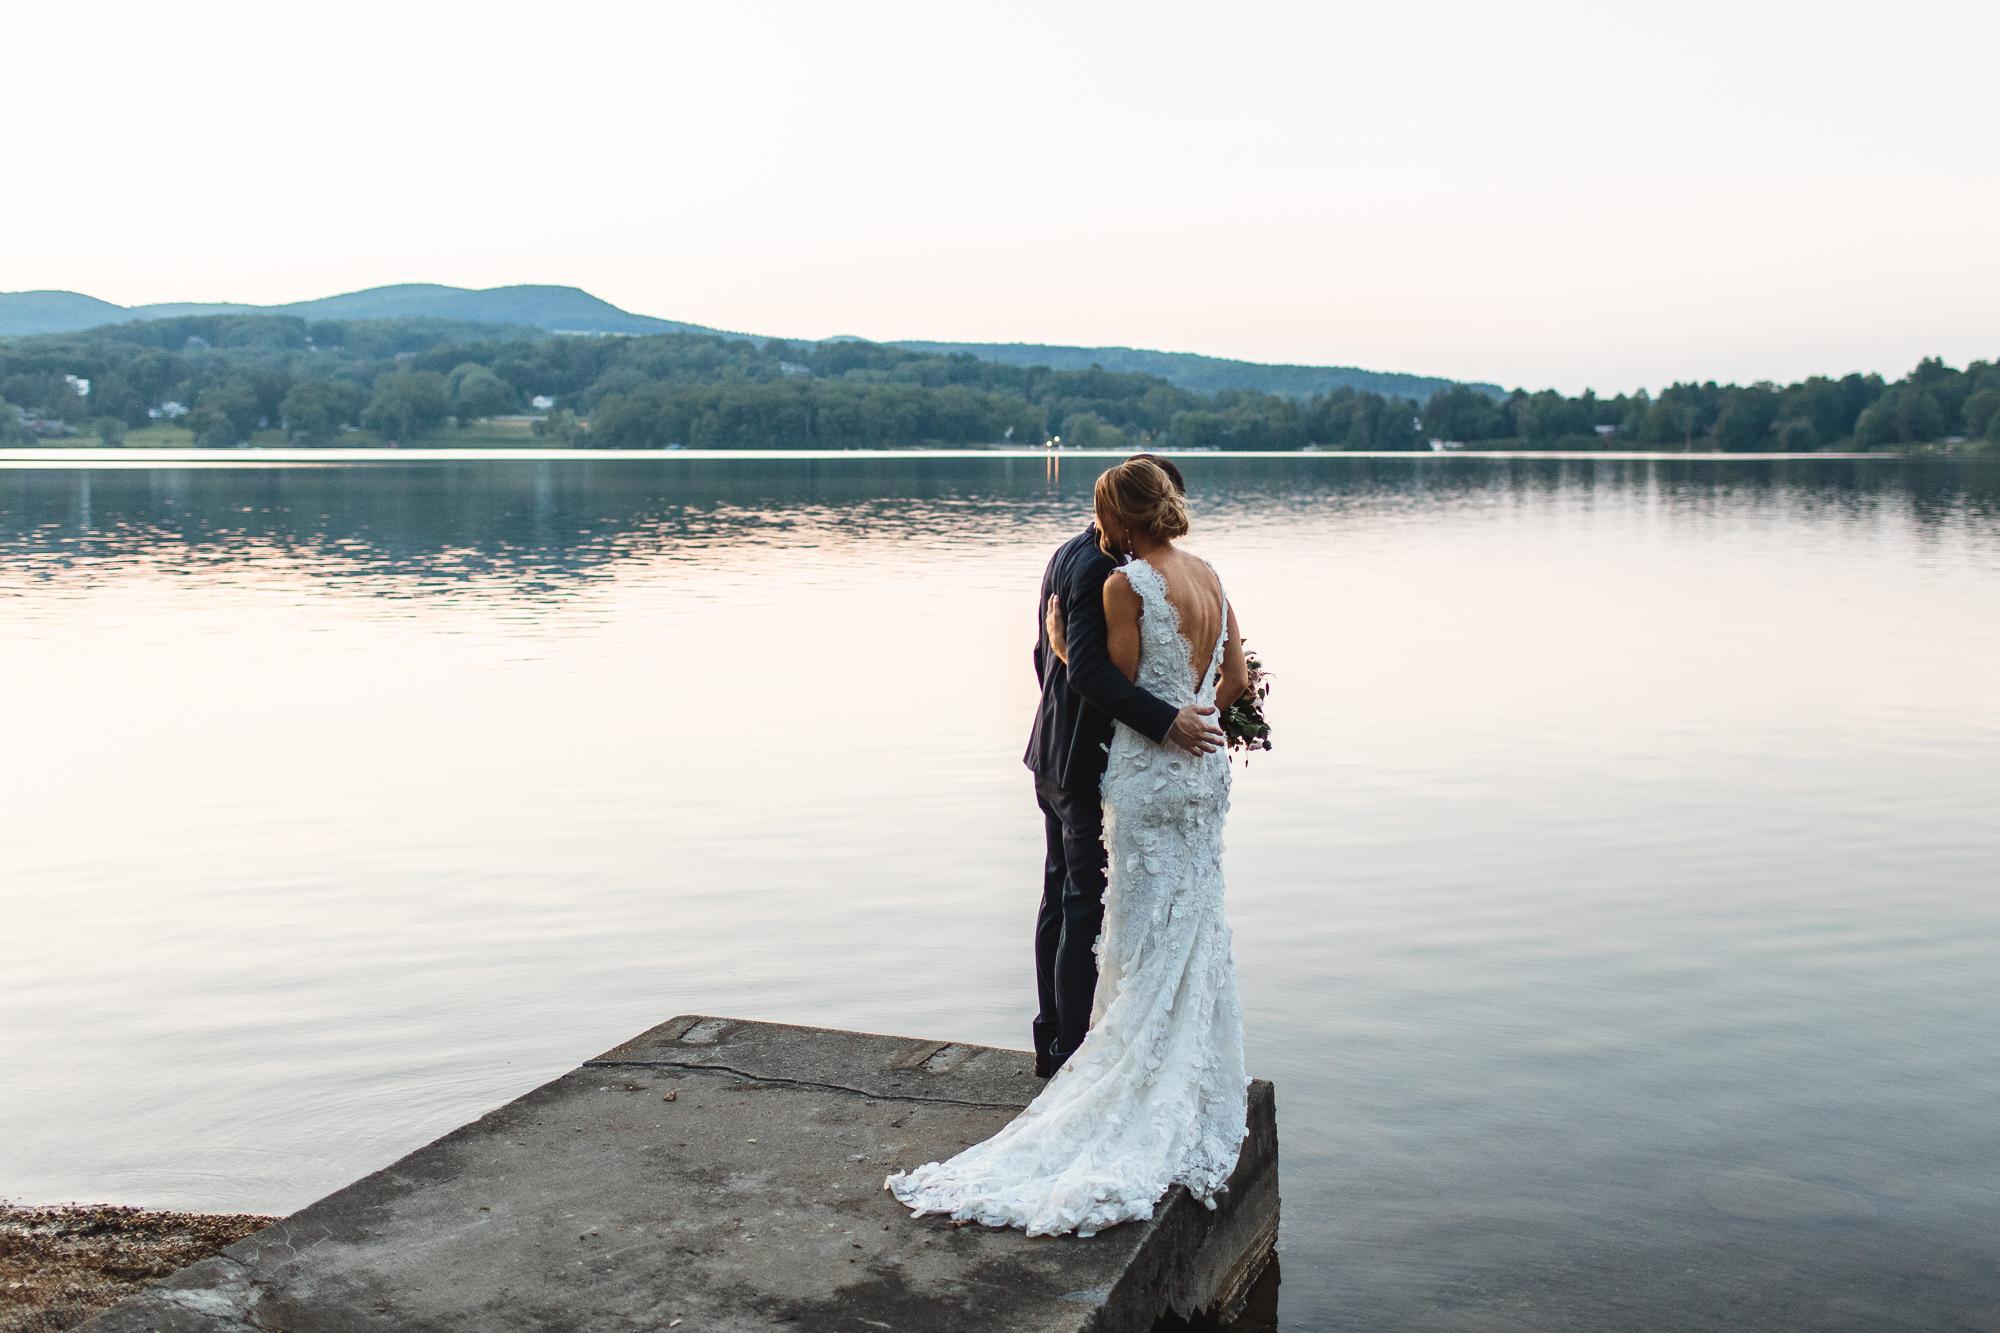 connecticut-summer-lake-wedding-emily-kirke-photography-upstyle (163 of 181).jpg